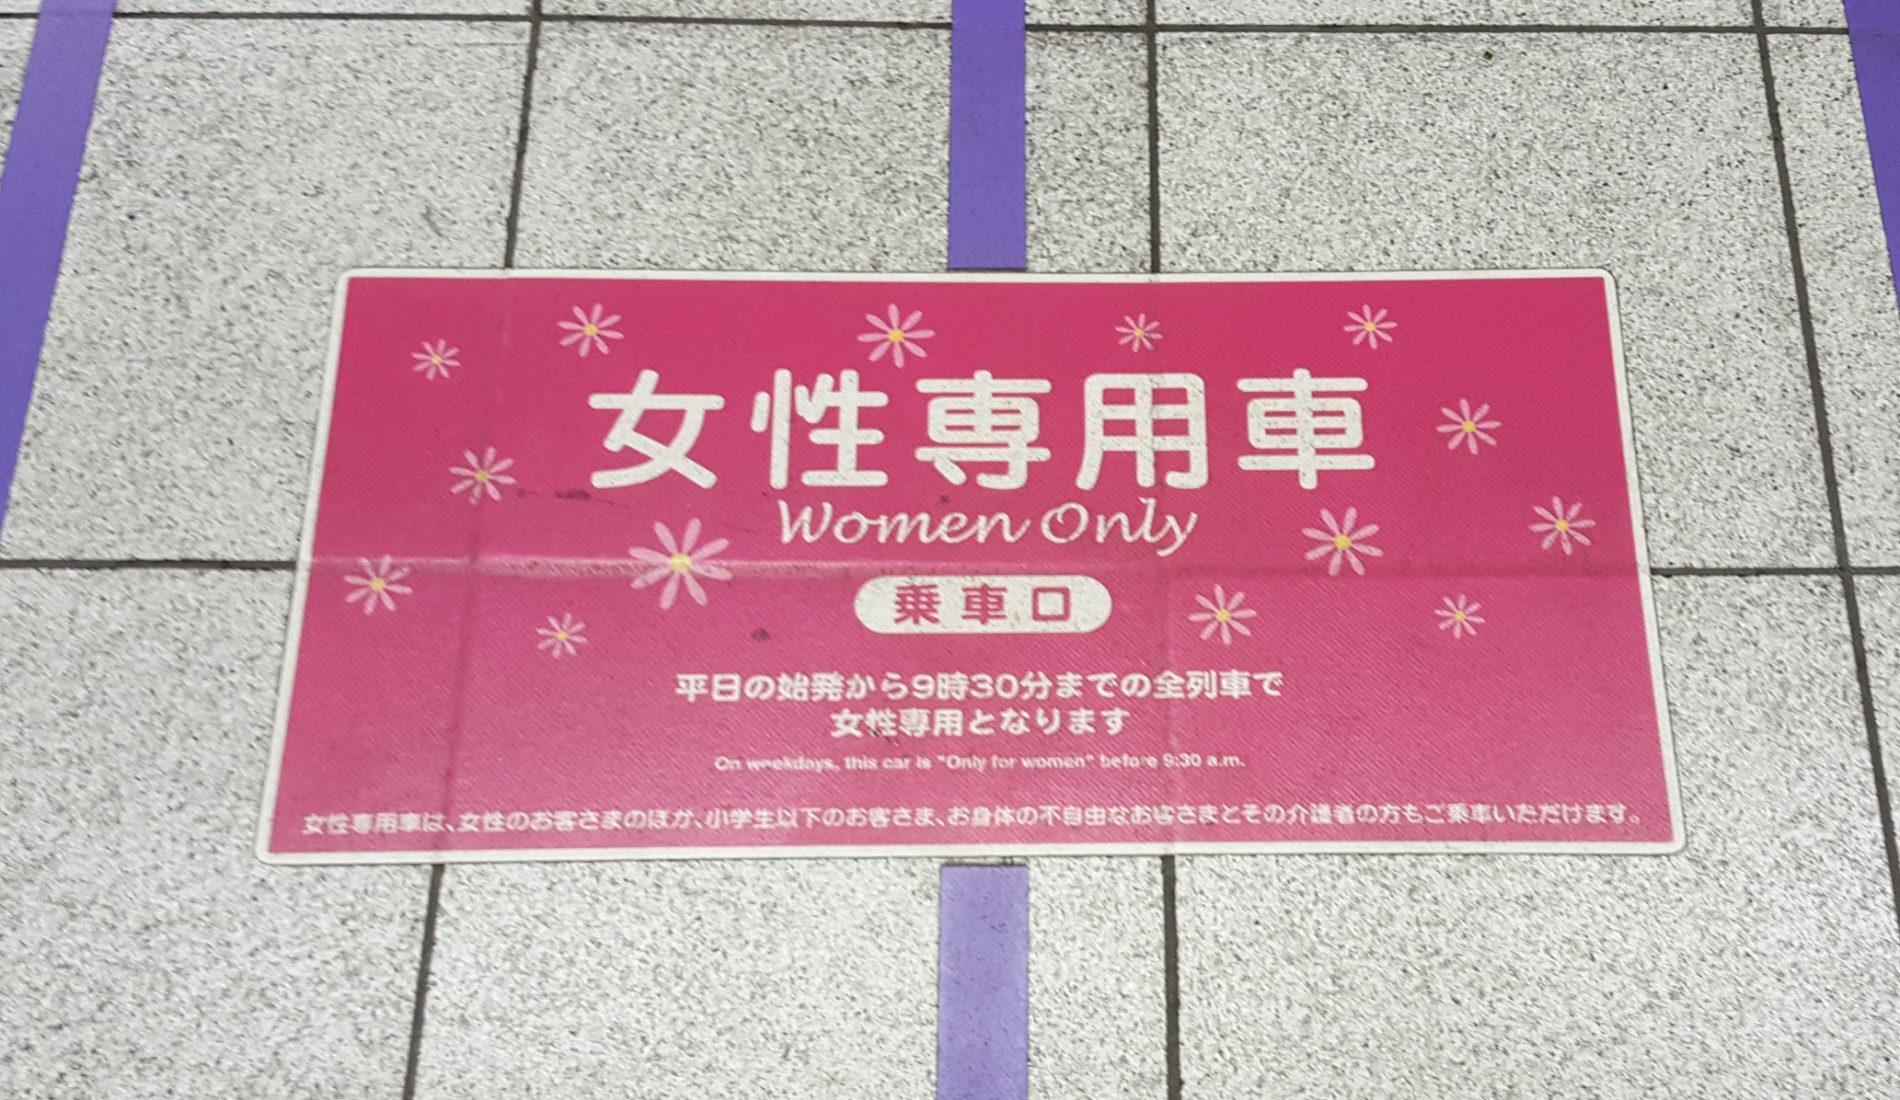 Weißer Japanische Kerl Frau img.rarediseaseday.org